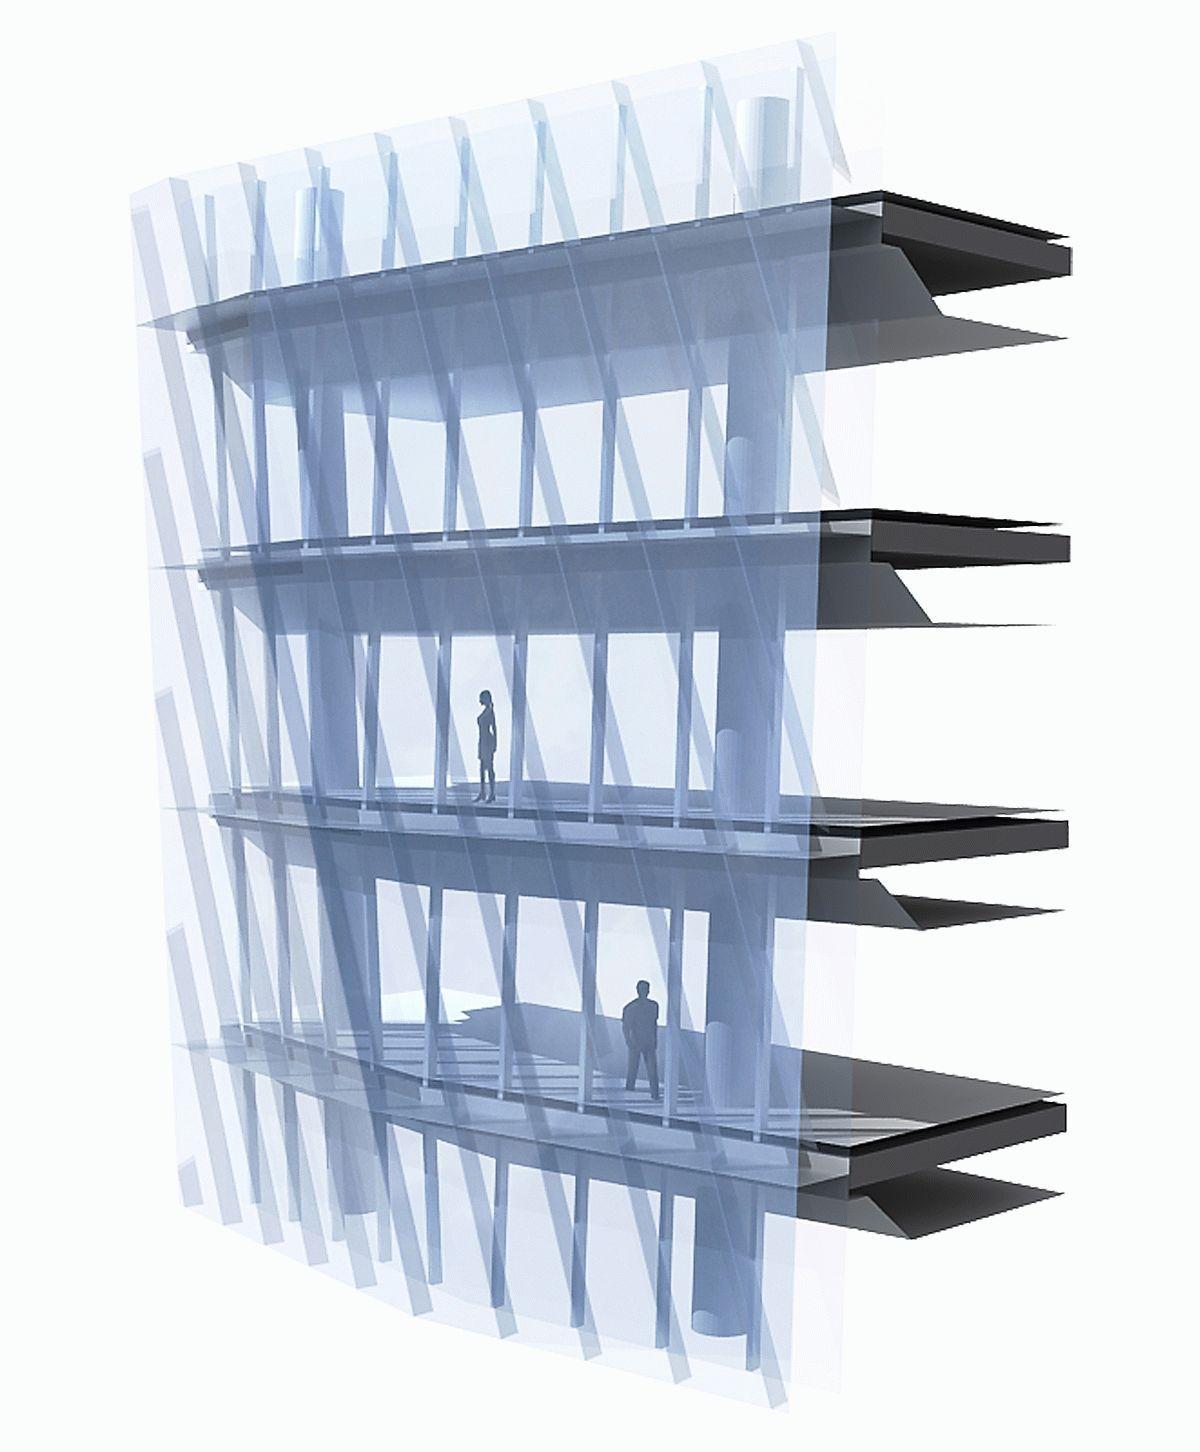 двухслойный фасад | Glass Facades Structure | Pinterest | Facades ...